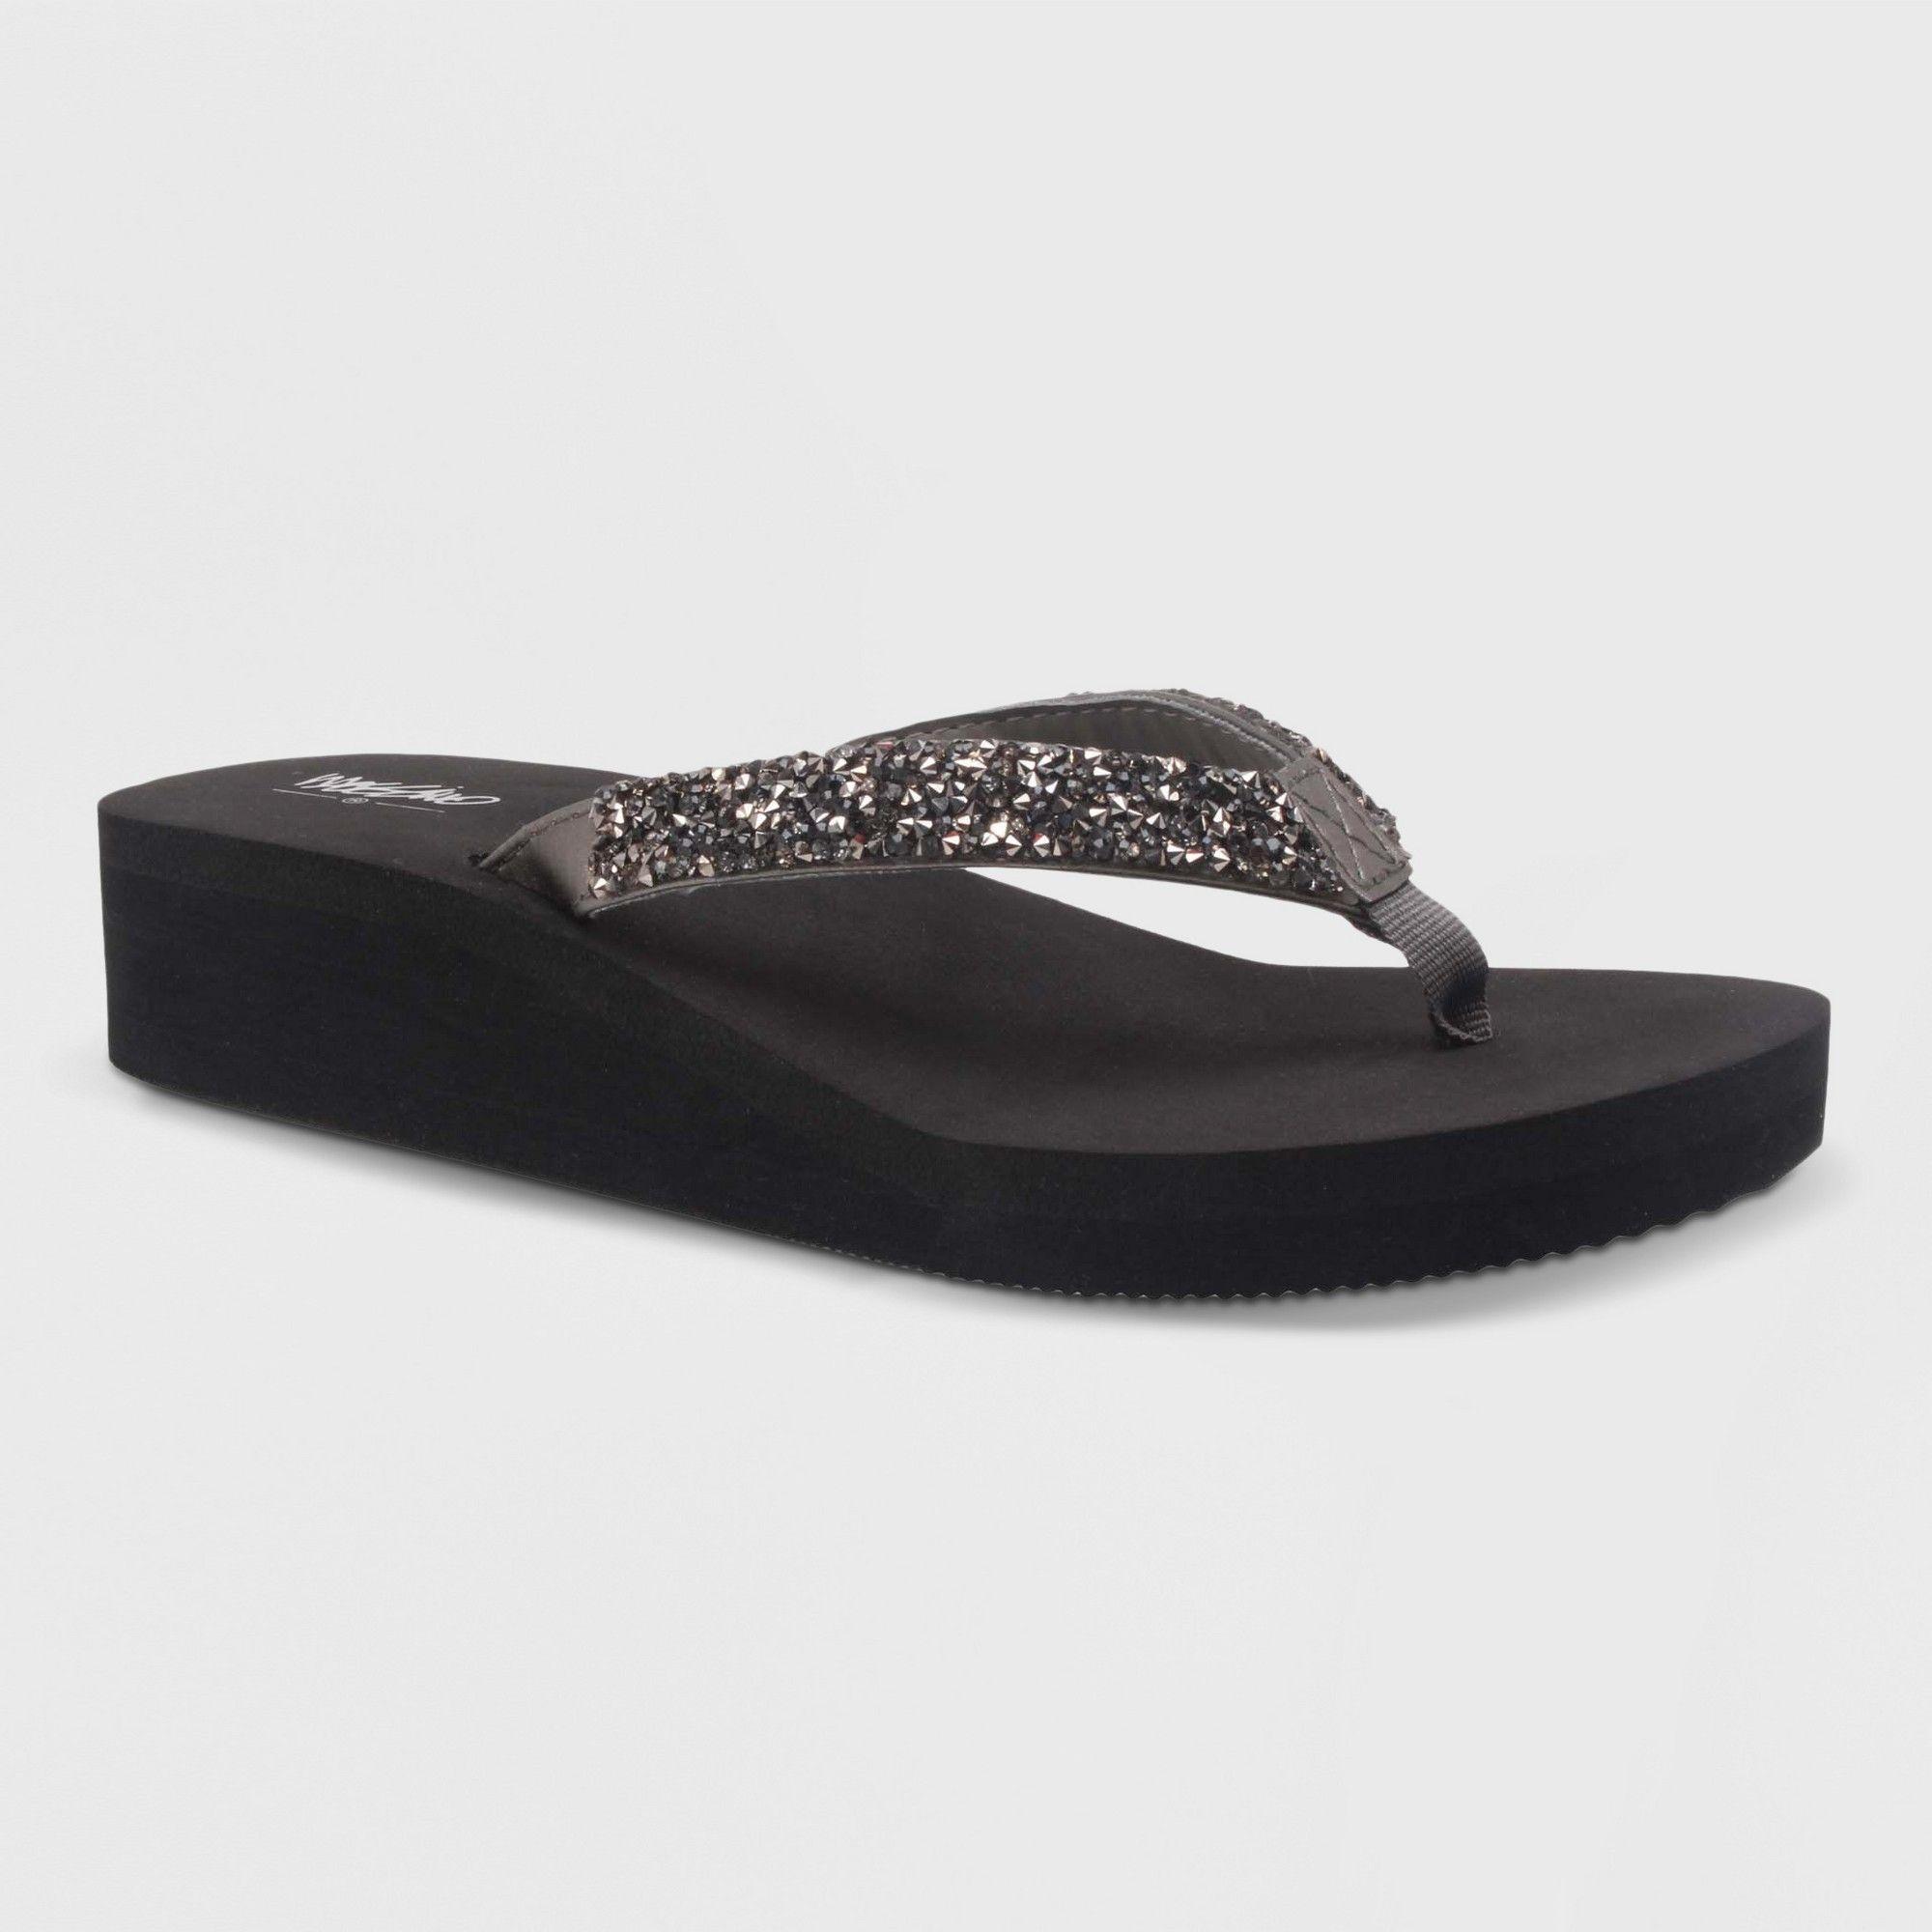 96bb6237711 Women s Lannette Flip Flop Sandals - Mossimo Silver 11